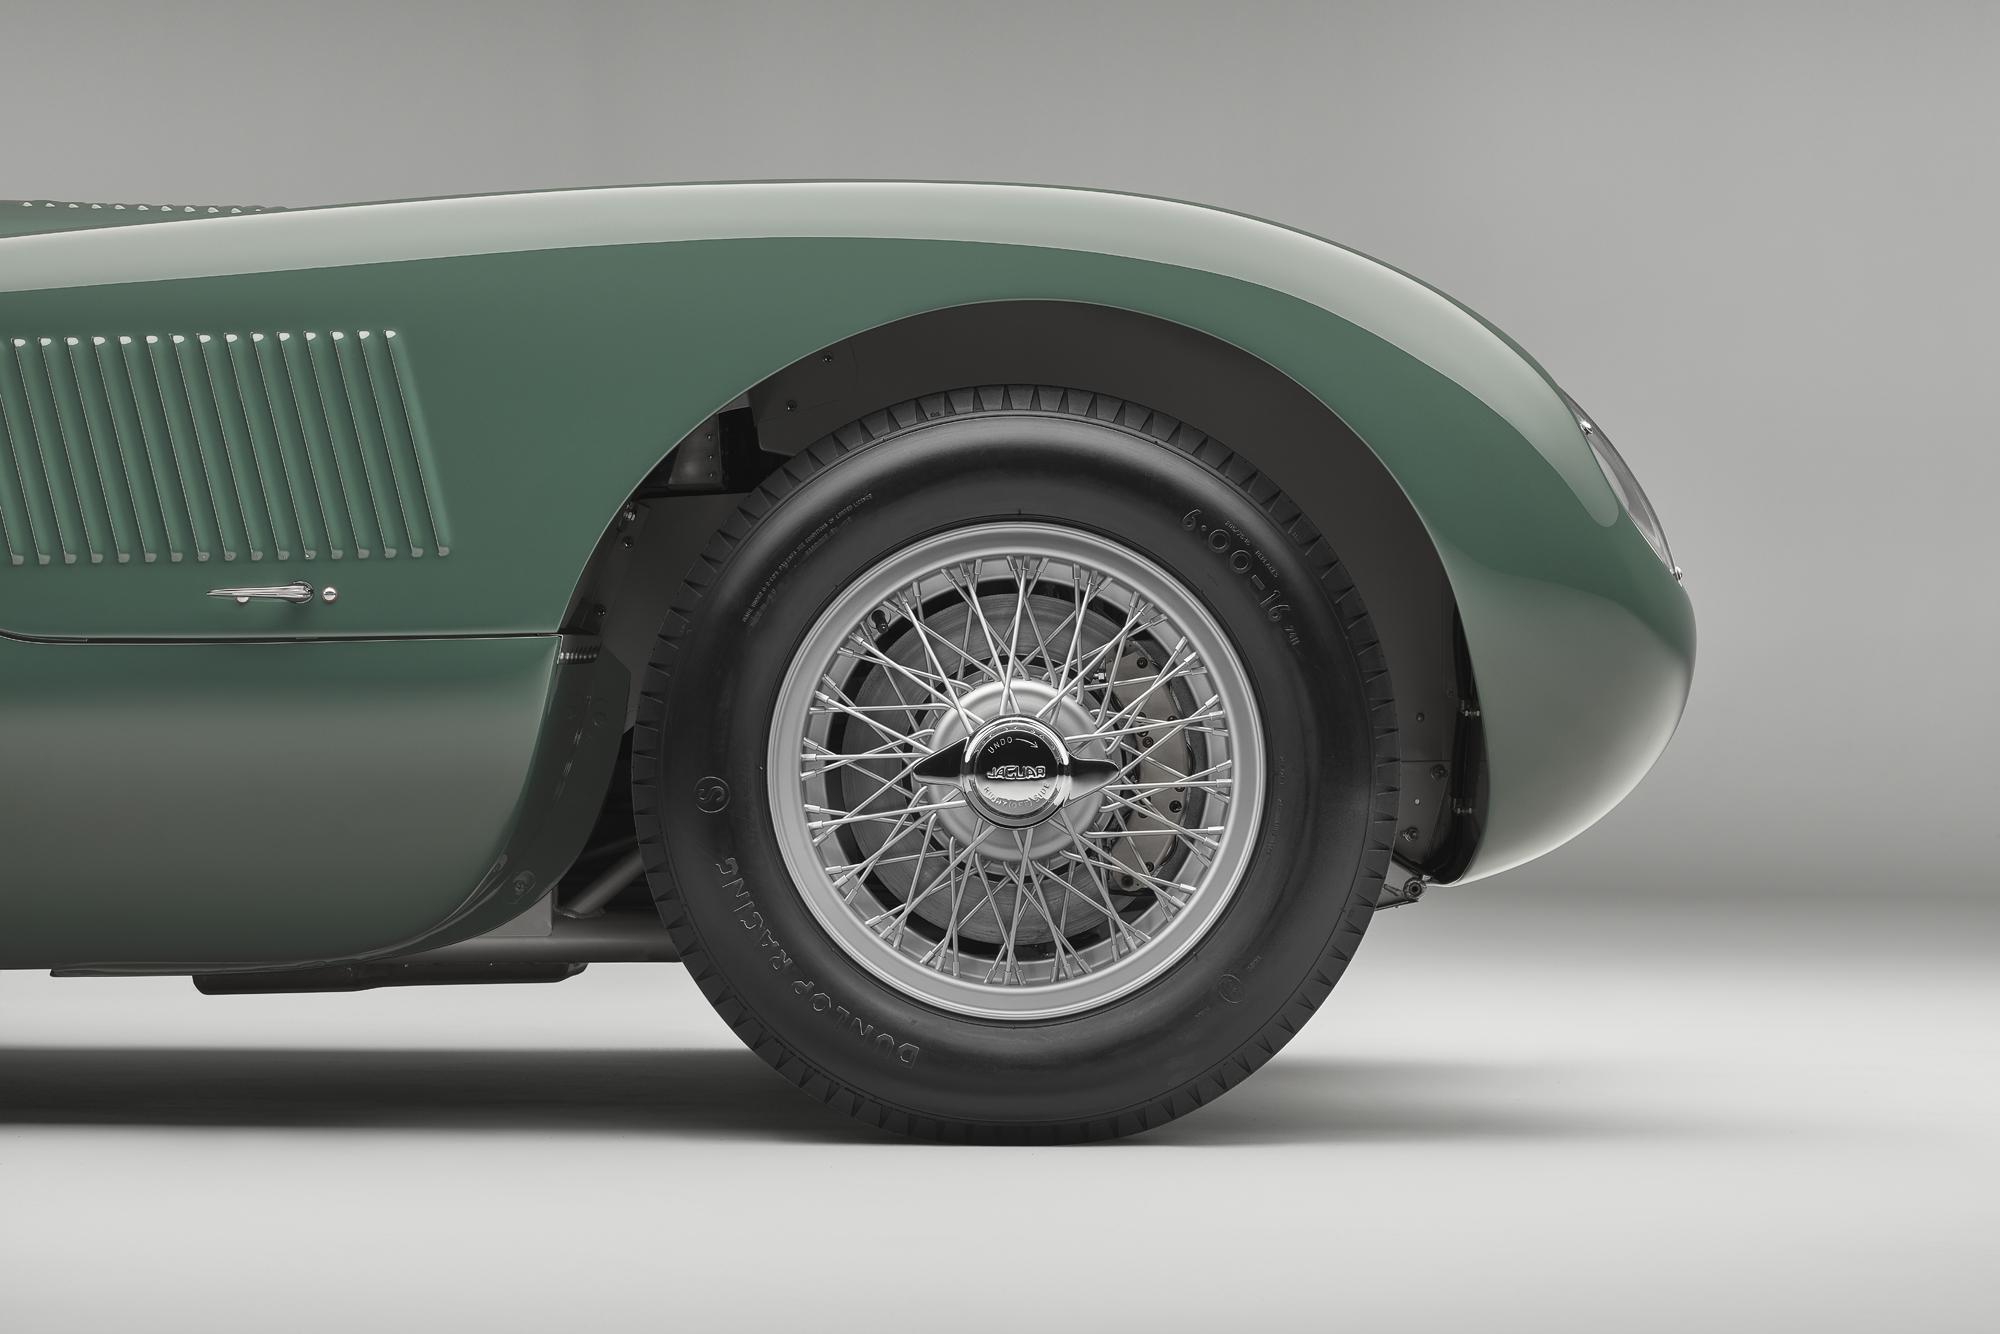 Jaguar C-type continuation wheel